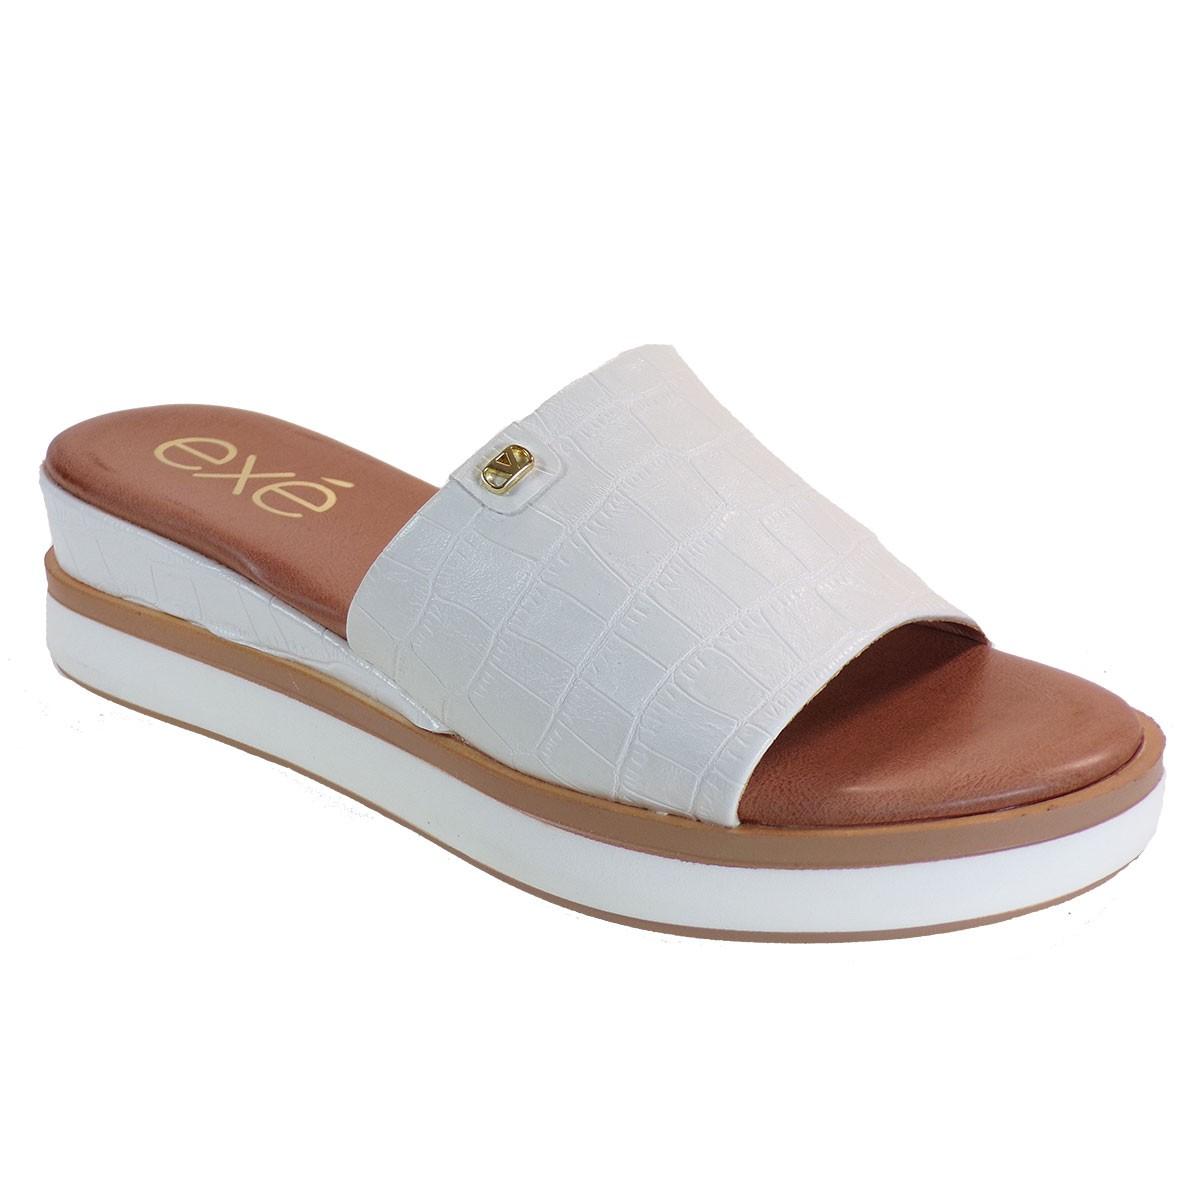 EXE Shoes Γυναικεία Παντόφλας Πλατφόρμες AMANDA-380 Λευκό Κροκό M47003802208